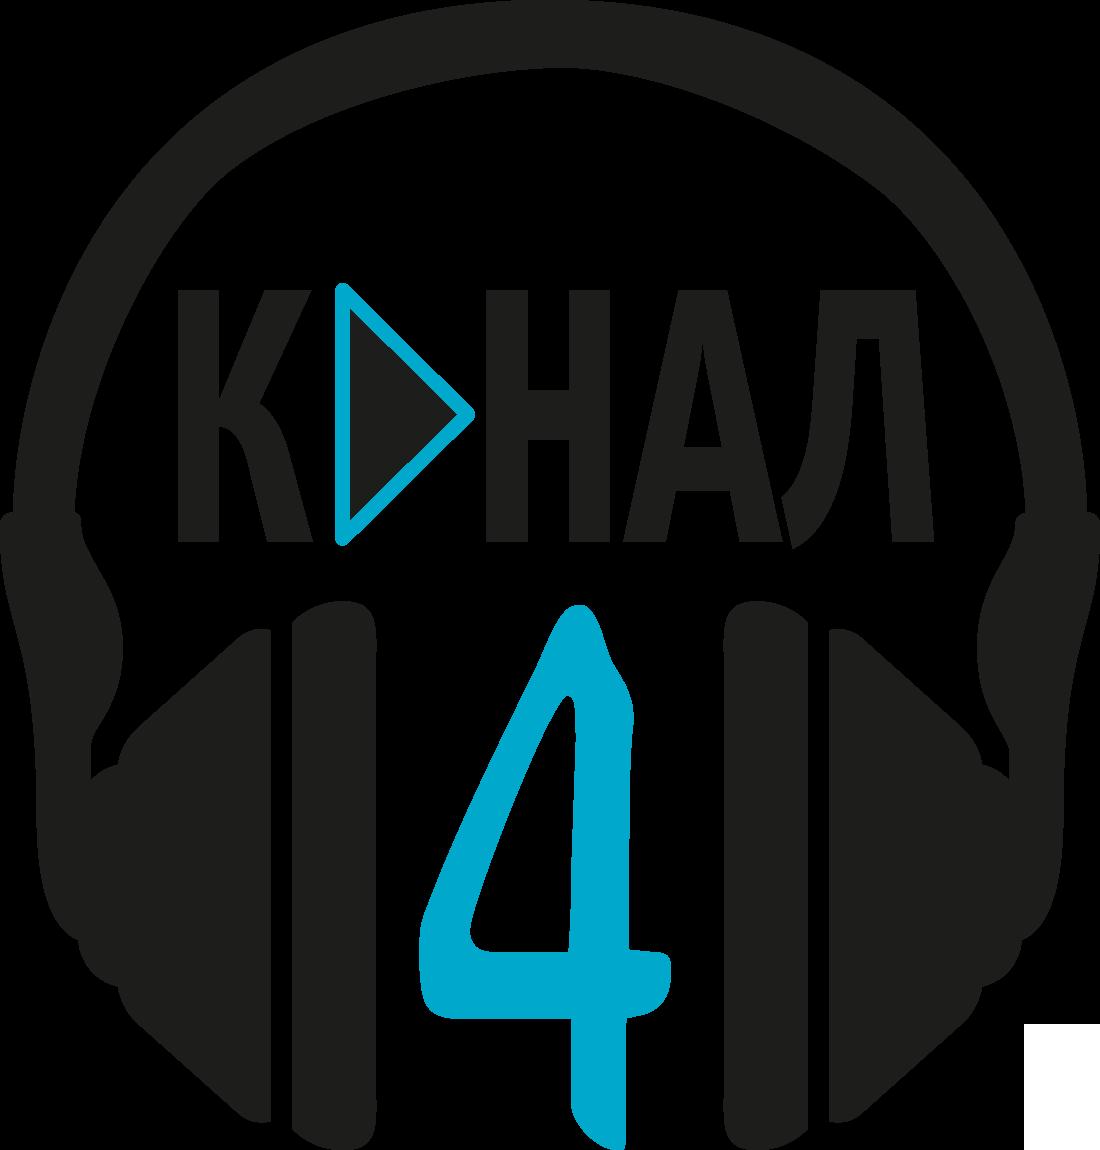 Kanal4_logo__black+blue_OK